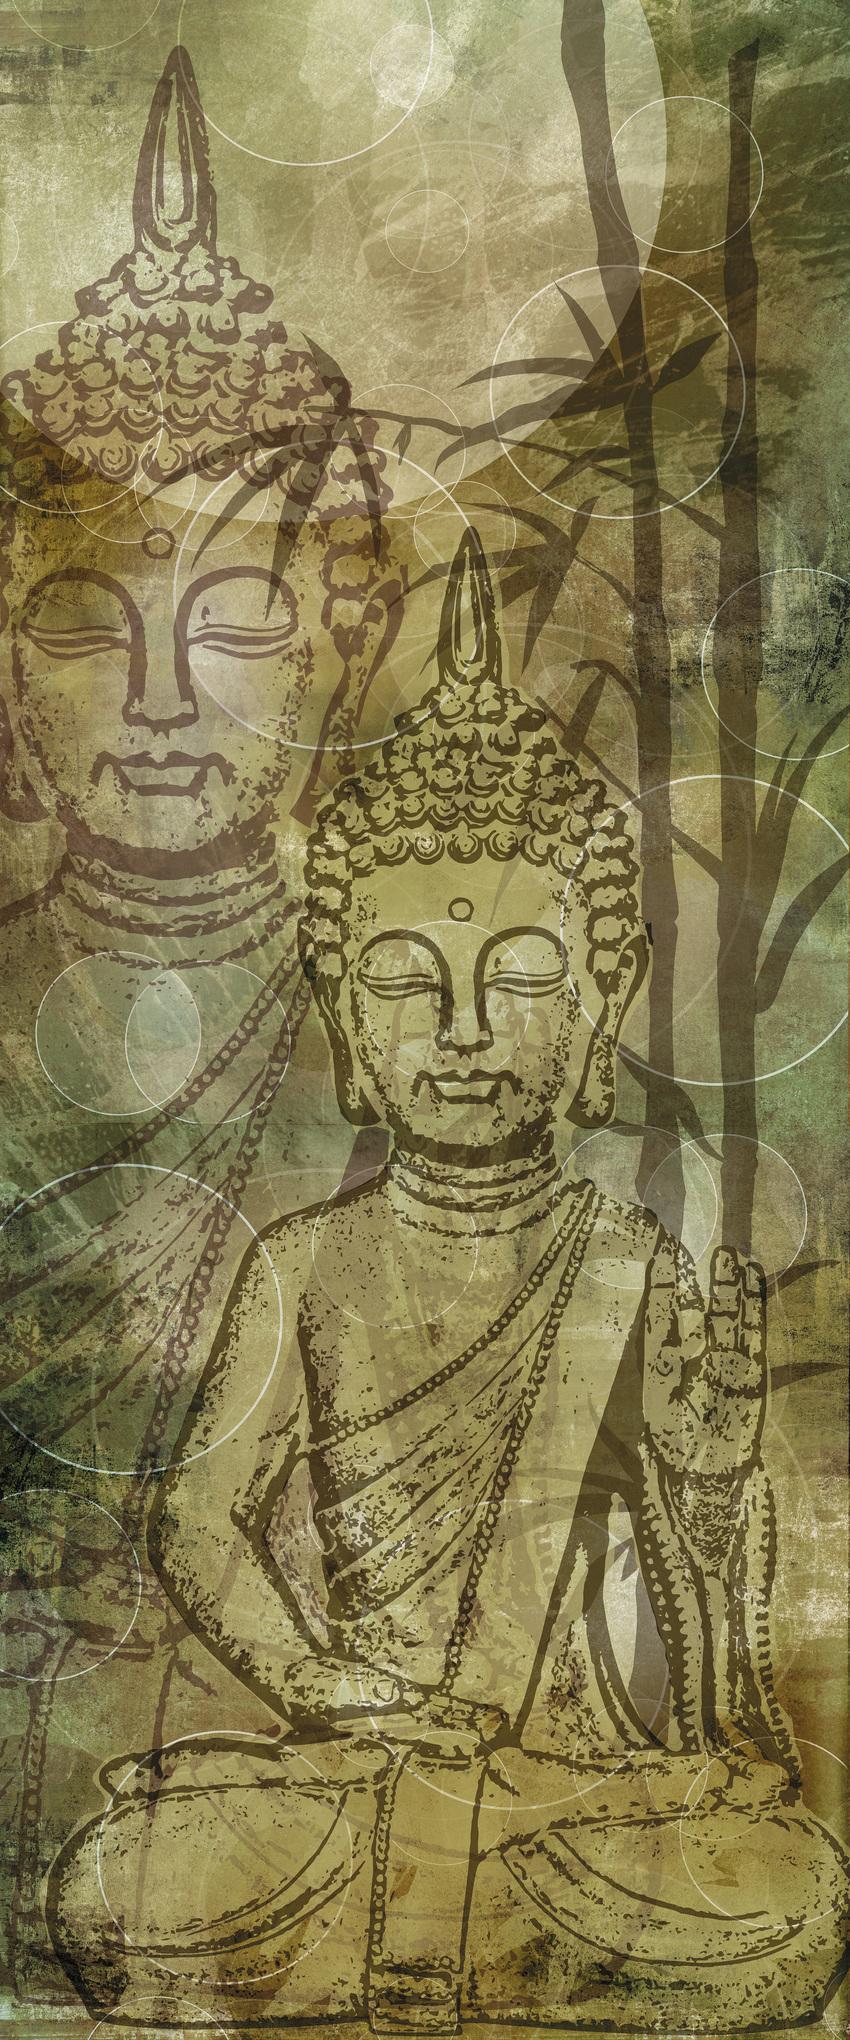 Buddha_7_1 Kopie.jpg